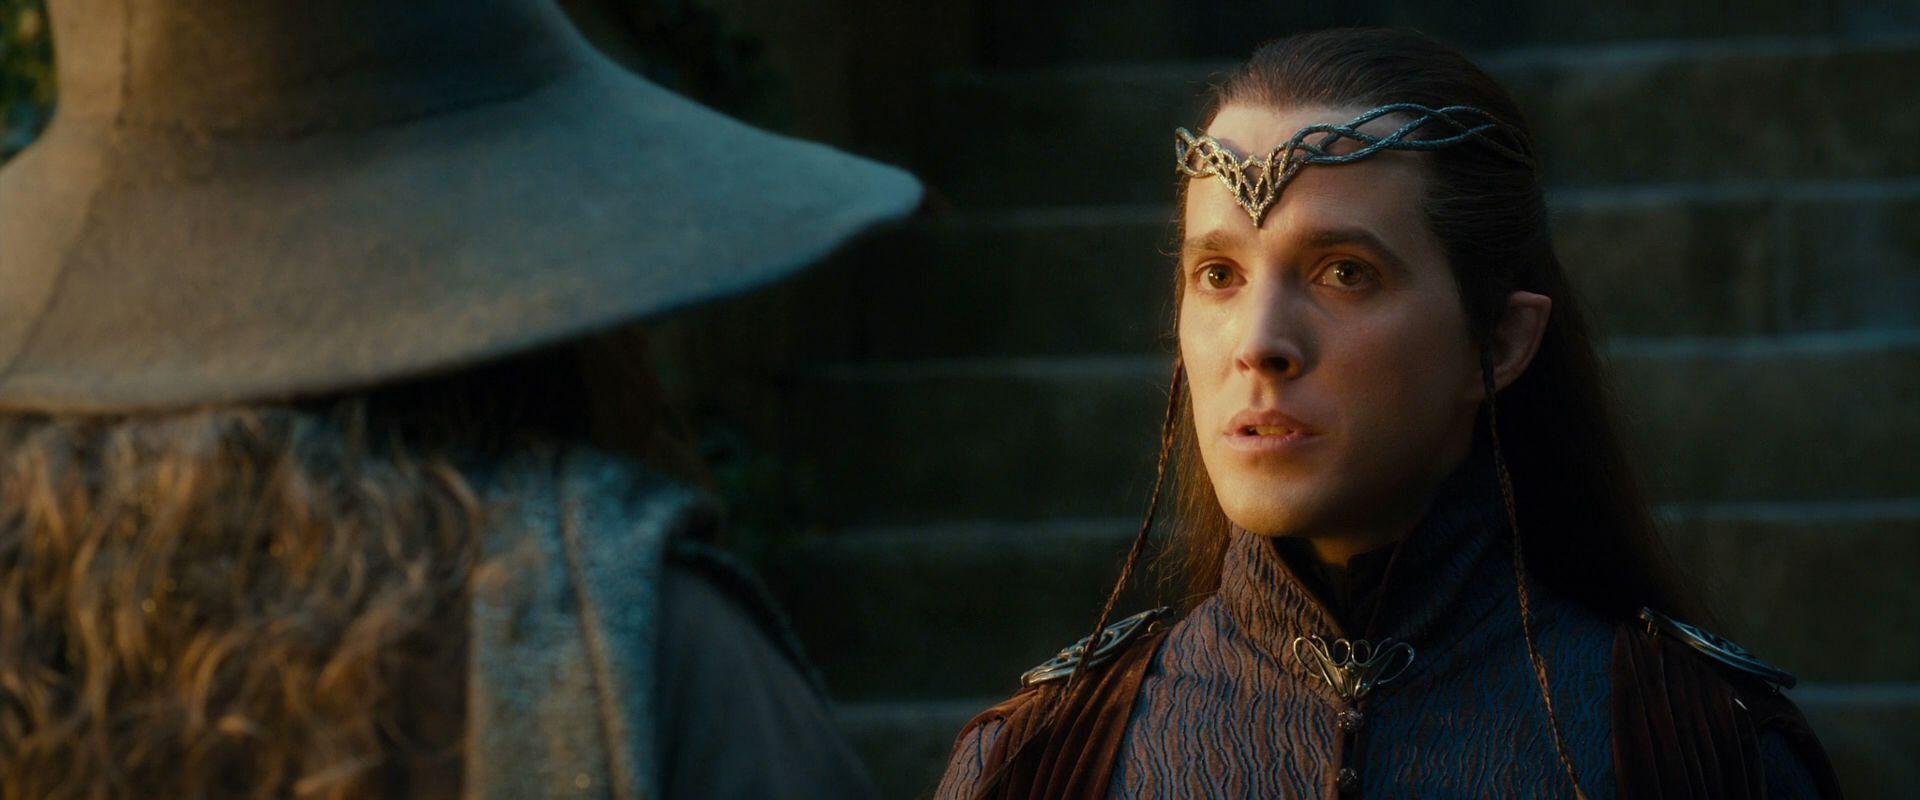 bret mckenzie as lindir an elflord in rivendell lord